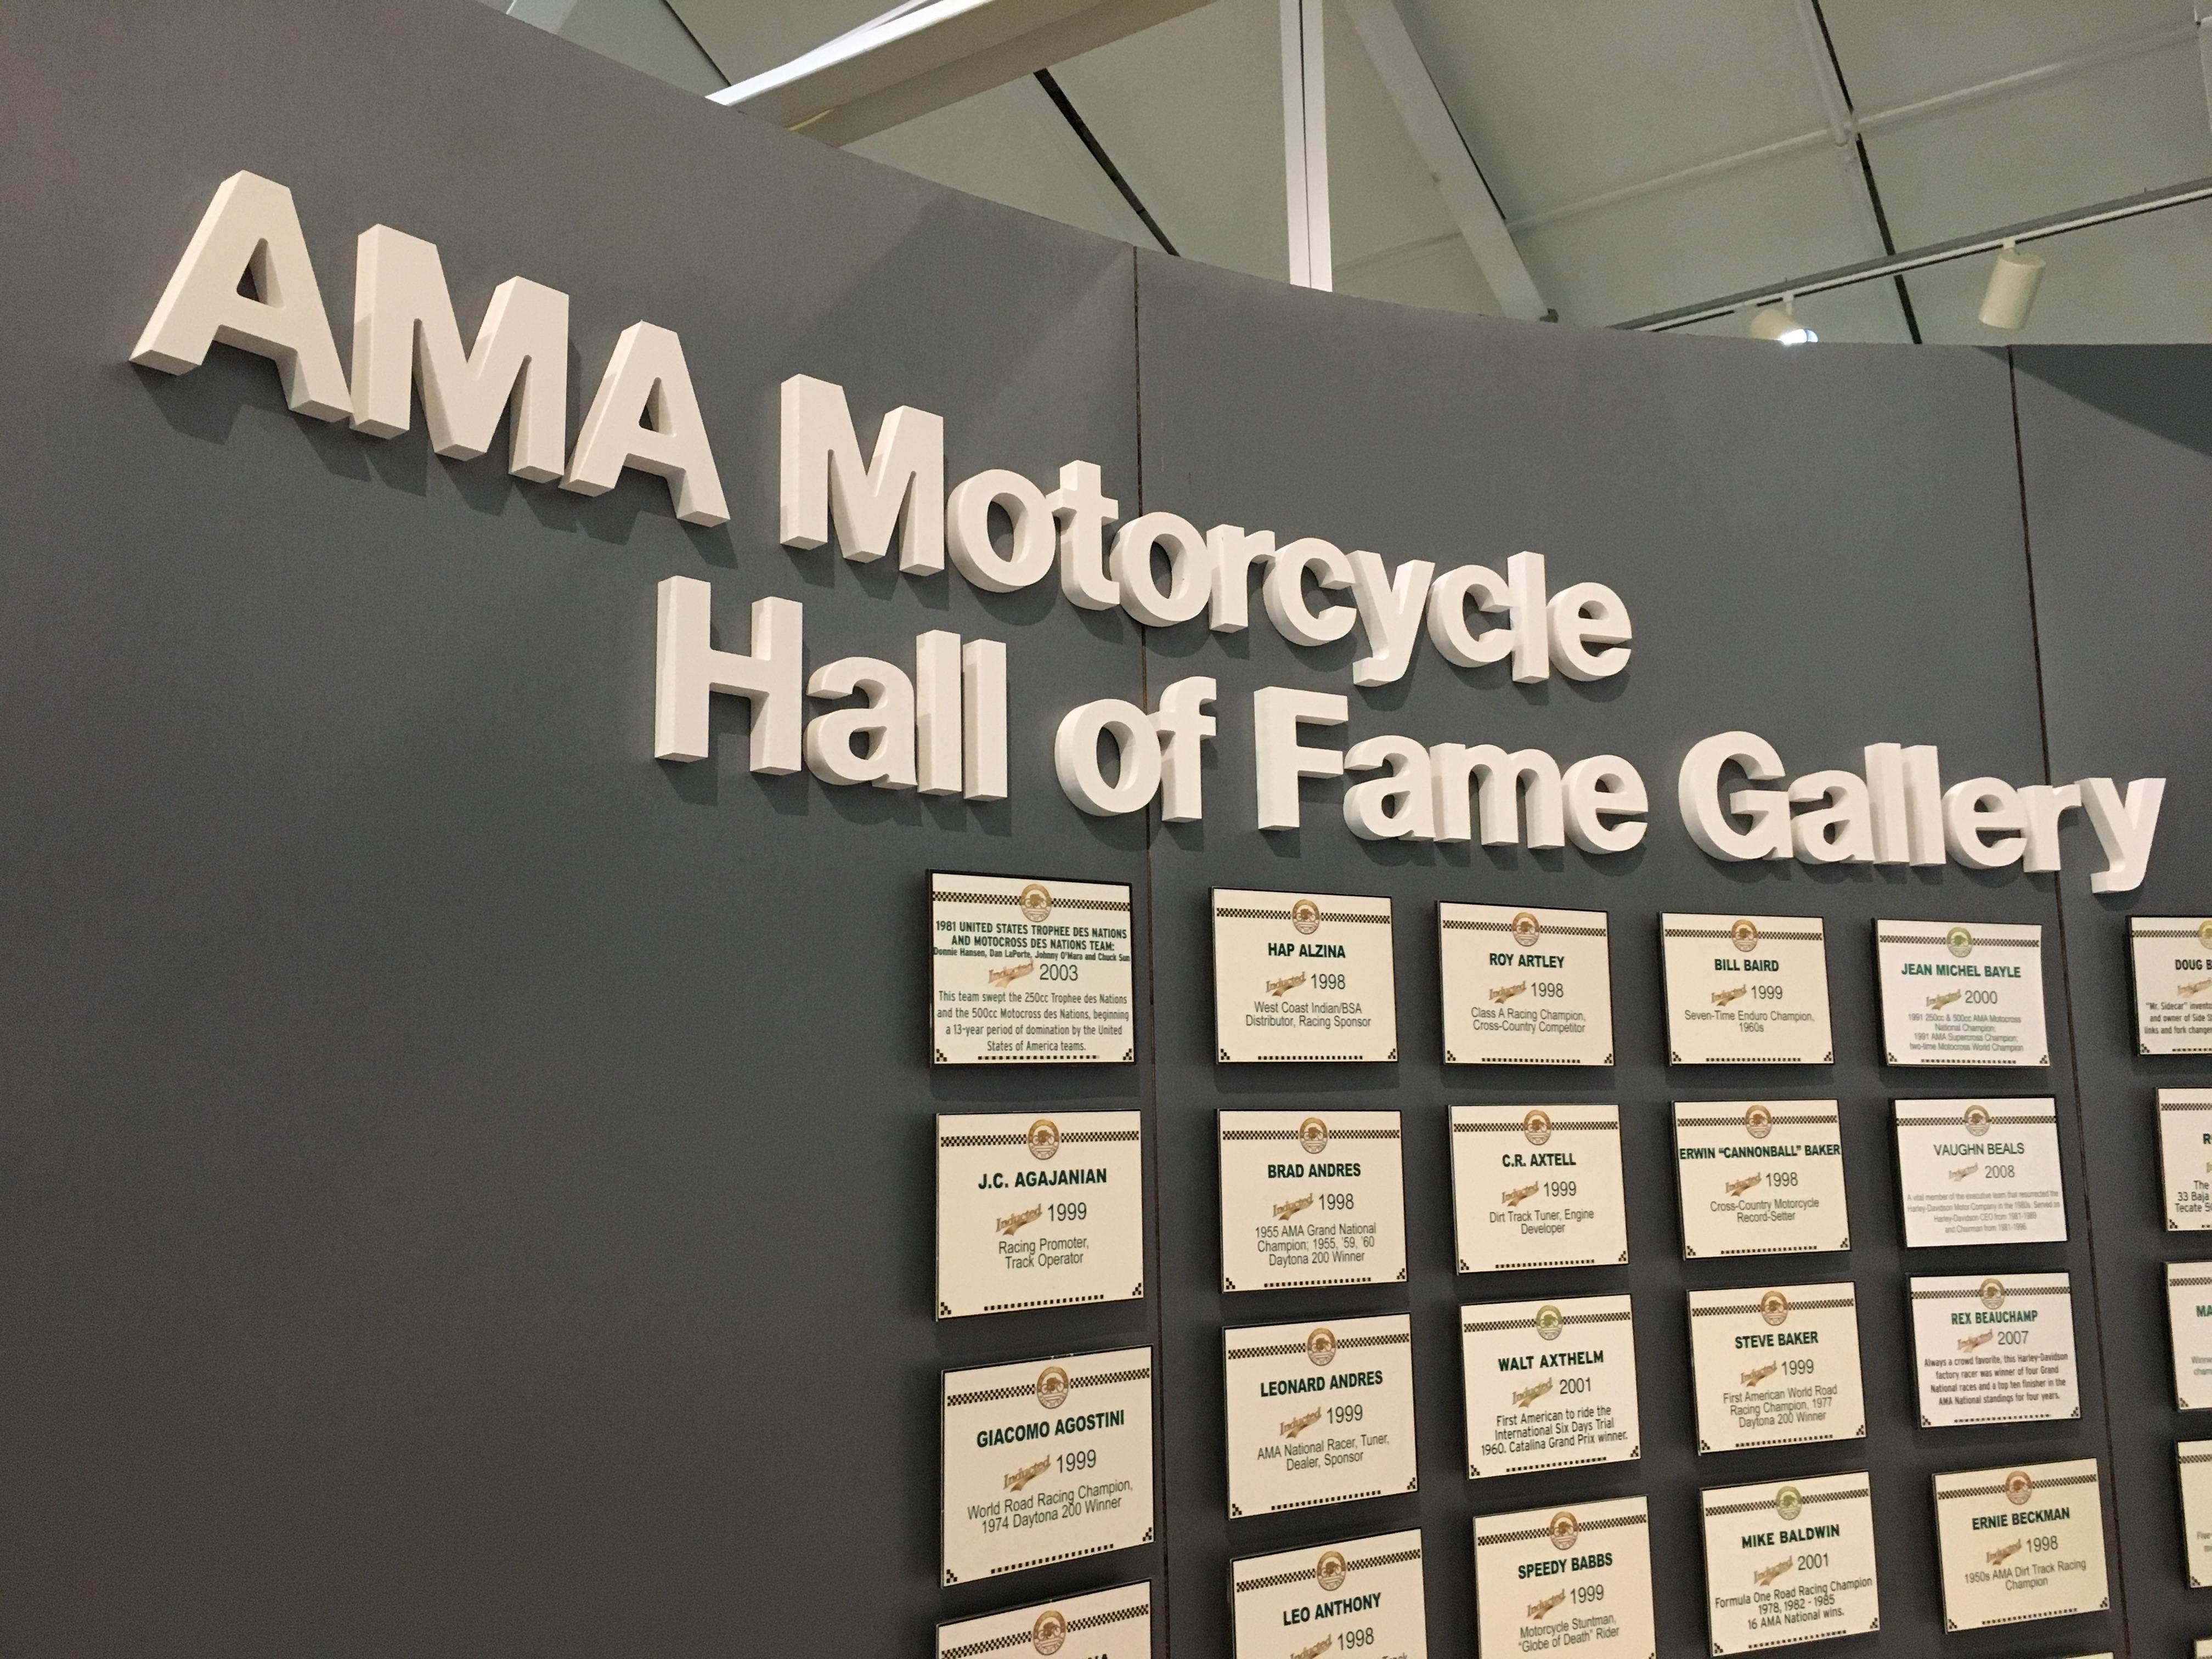 The AMA Hall of Fame